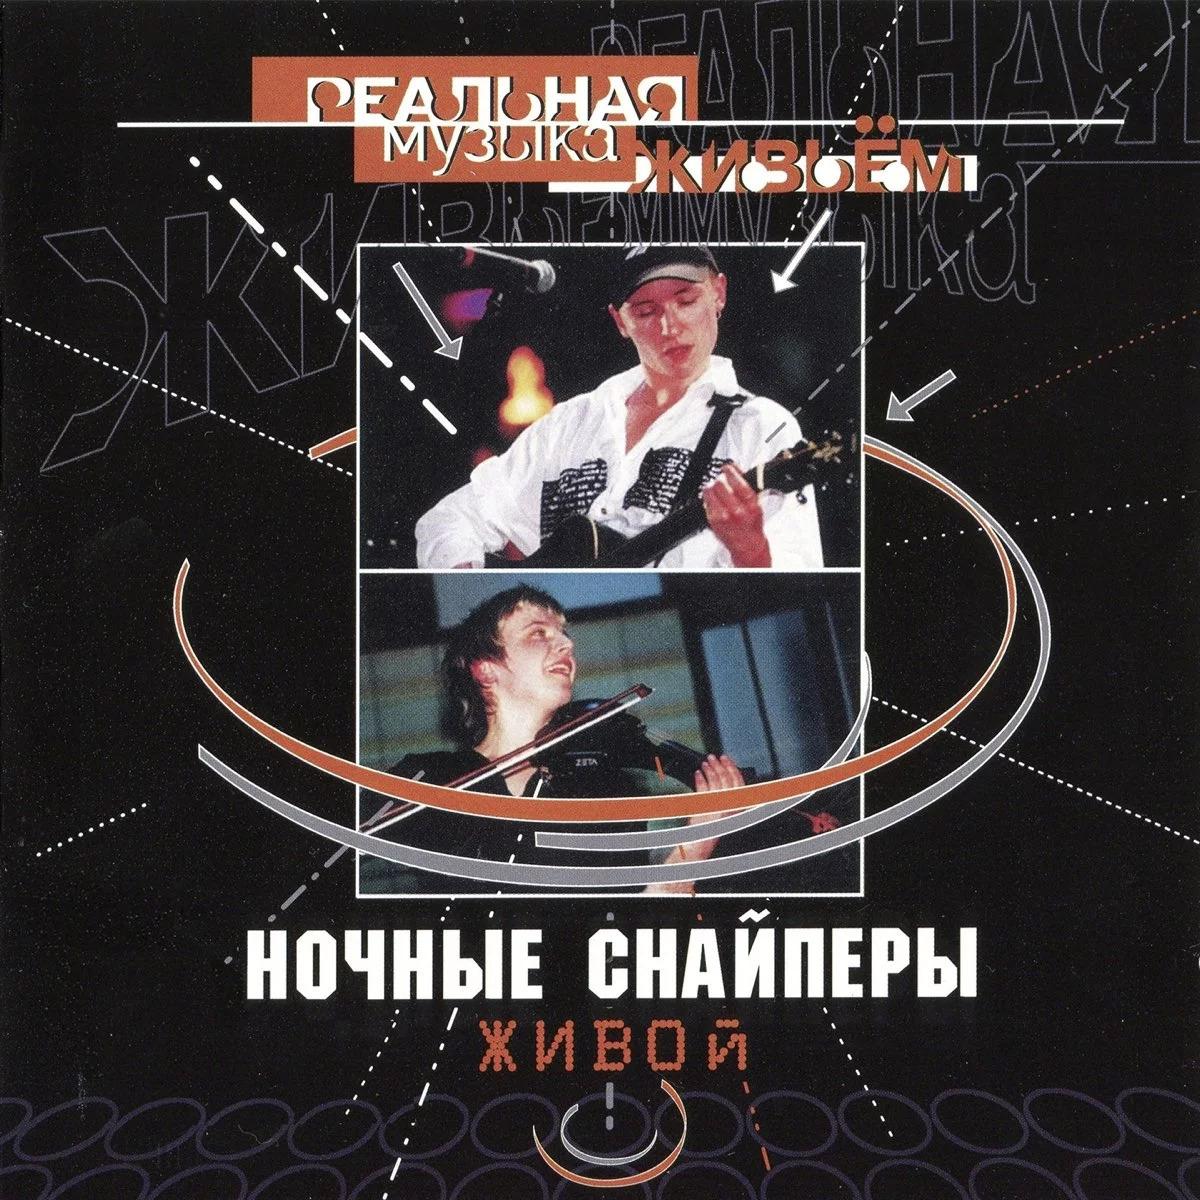 http://upload.wikimedia.org/wikipedia/ru/b/ba/Живой.jpg